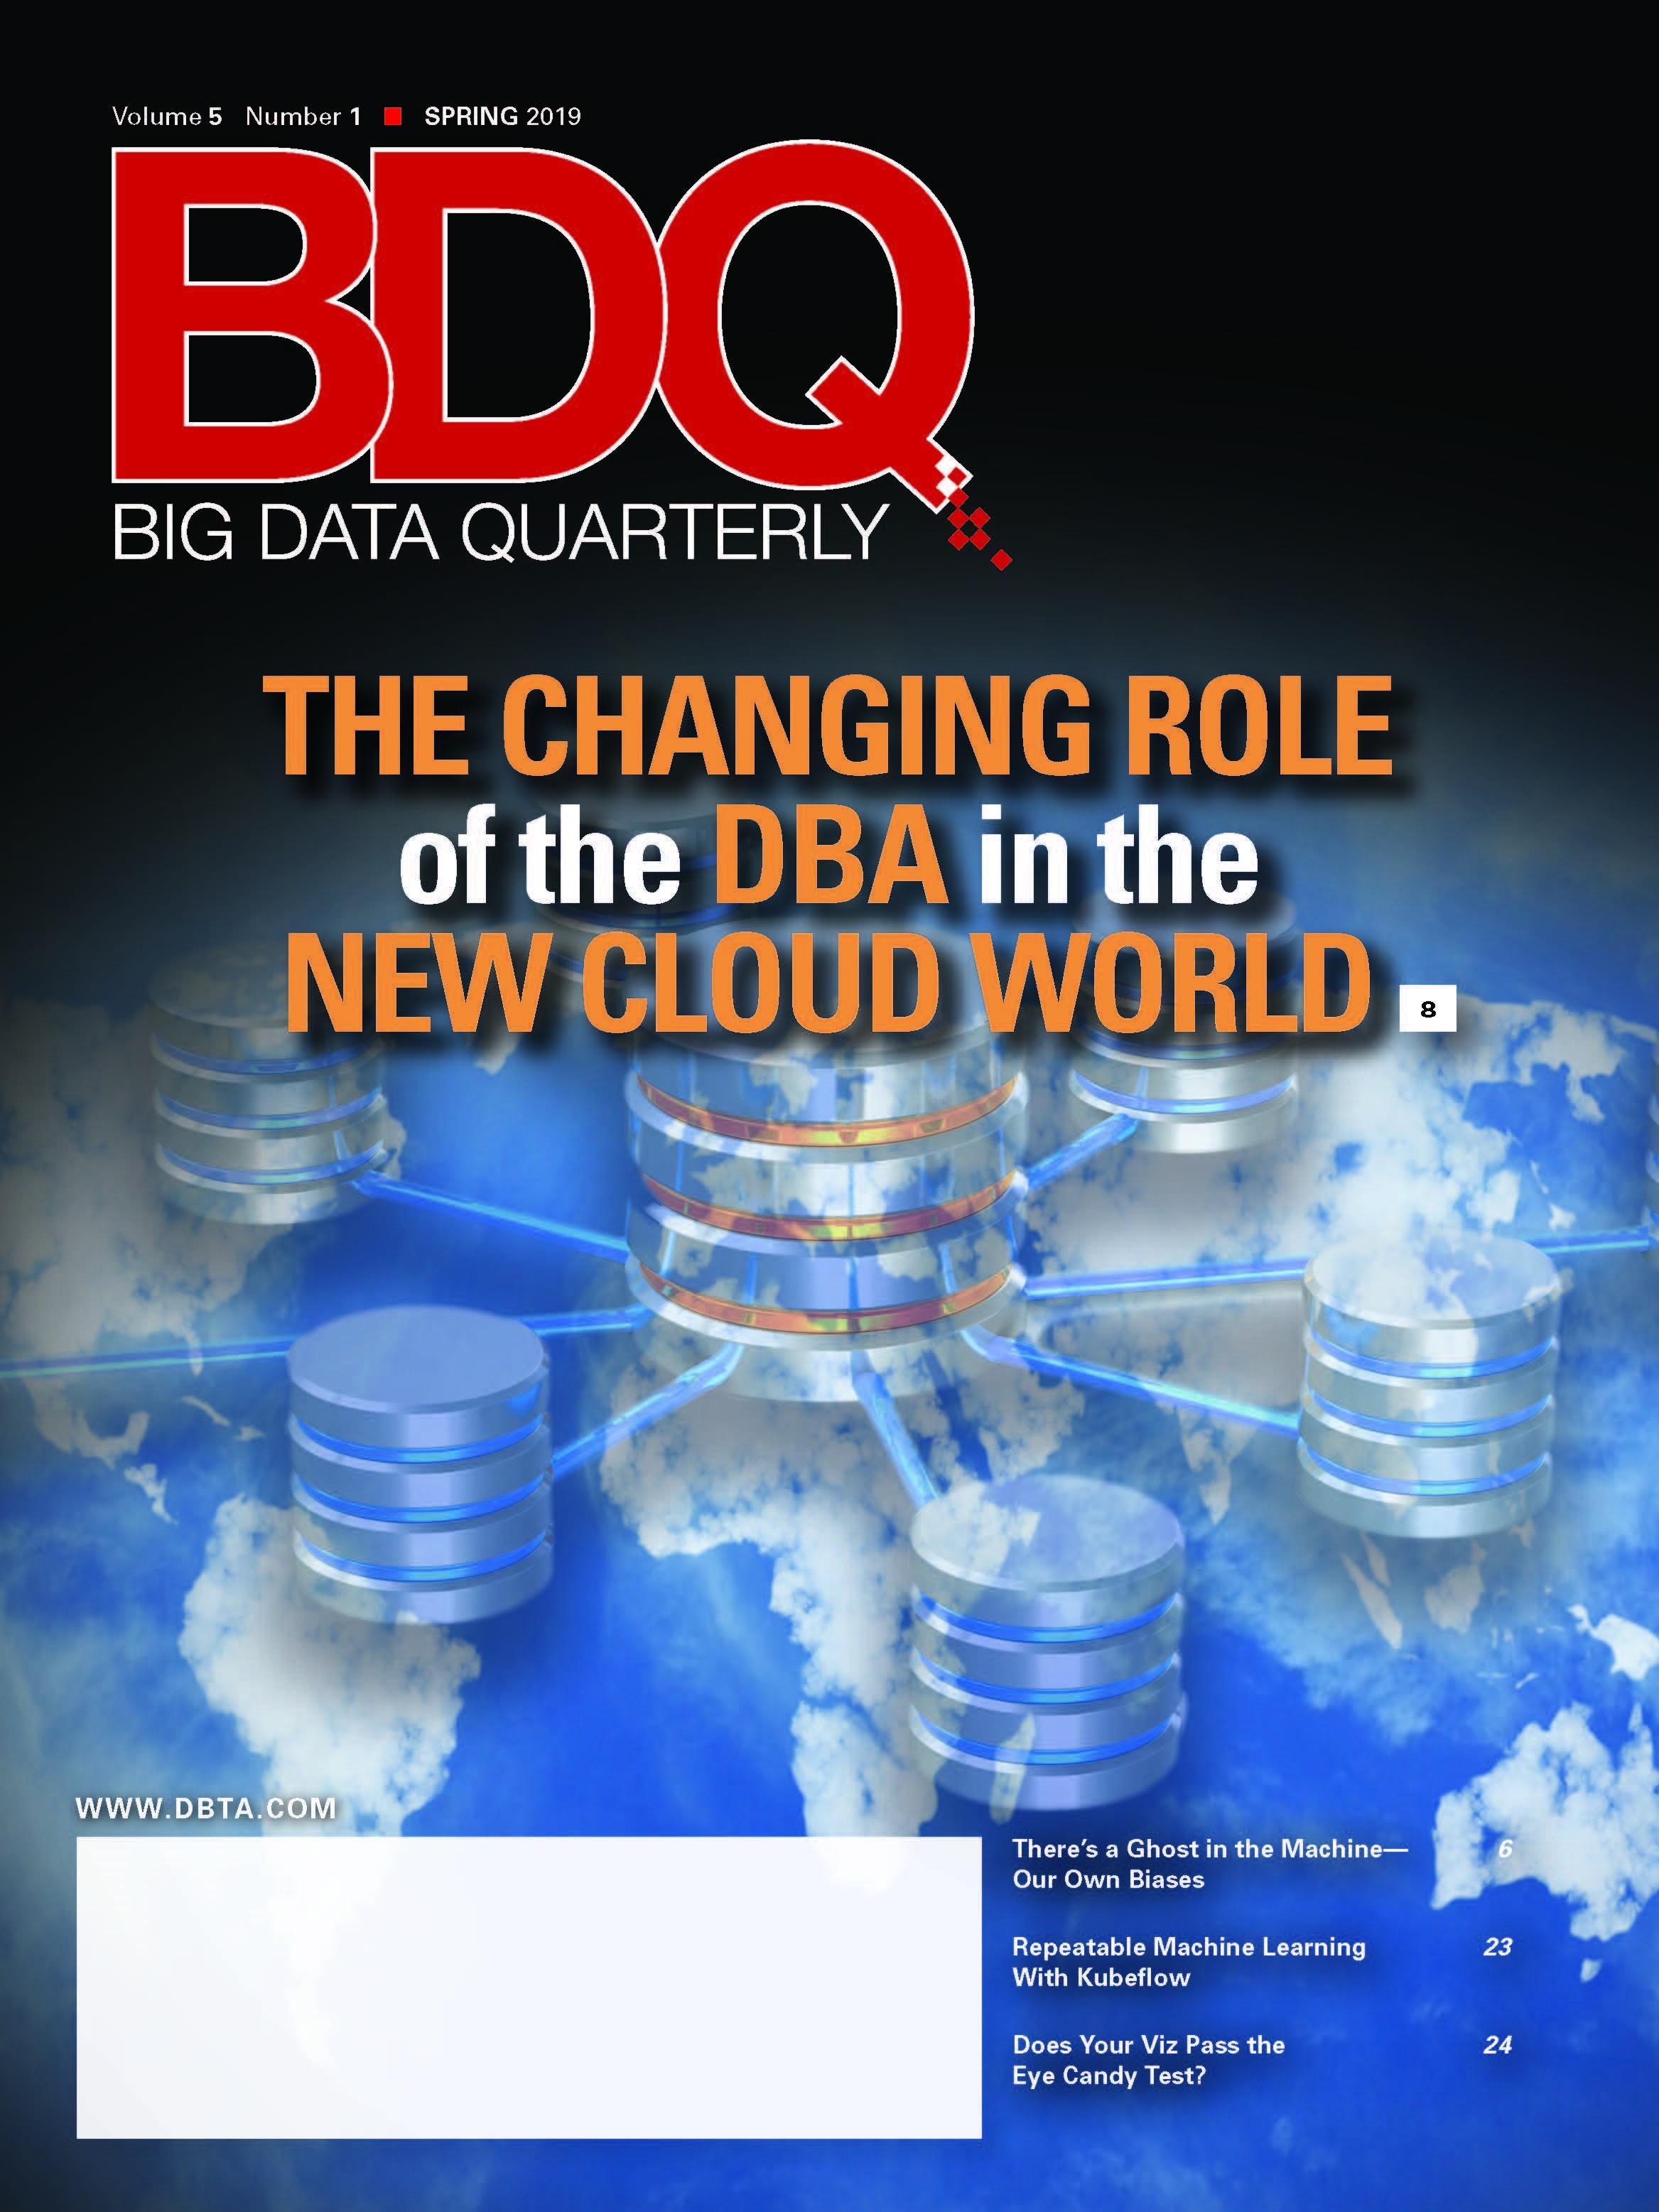 Big Data Quarterly: Spring 2019 Issue